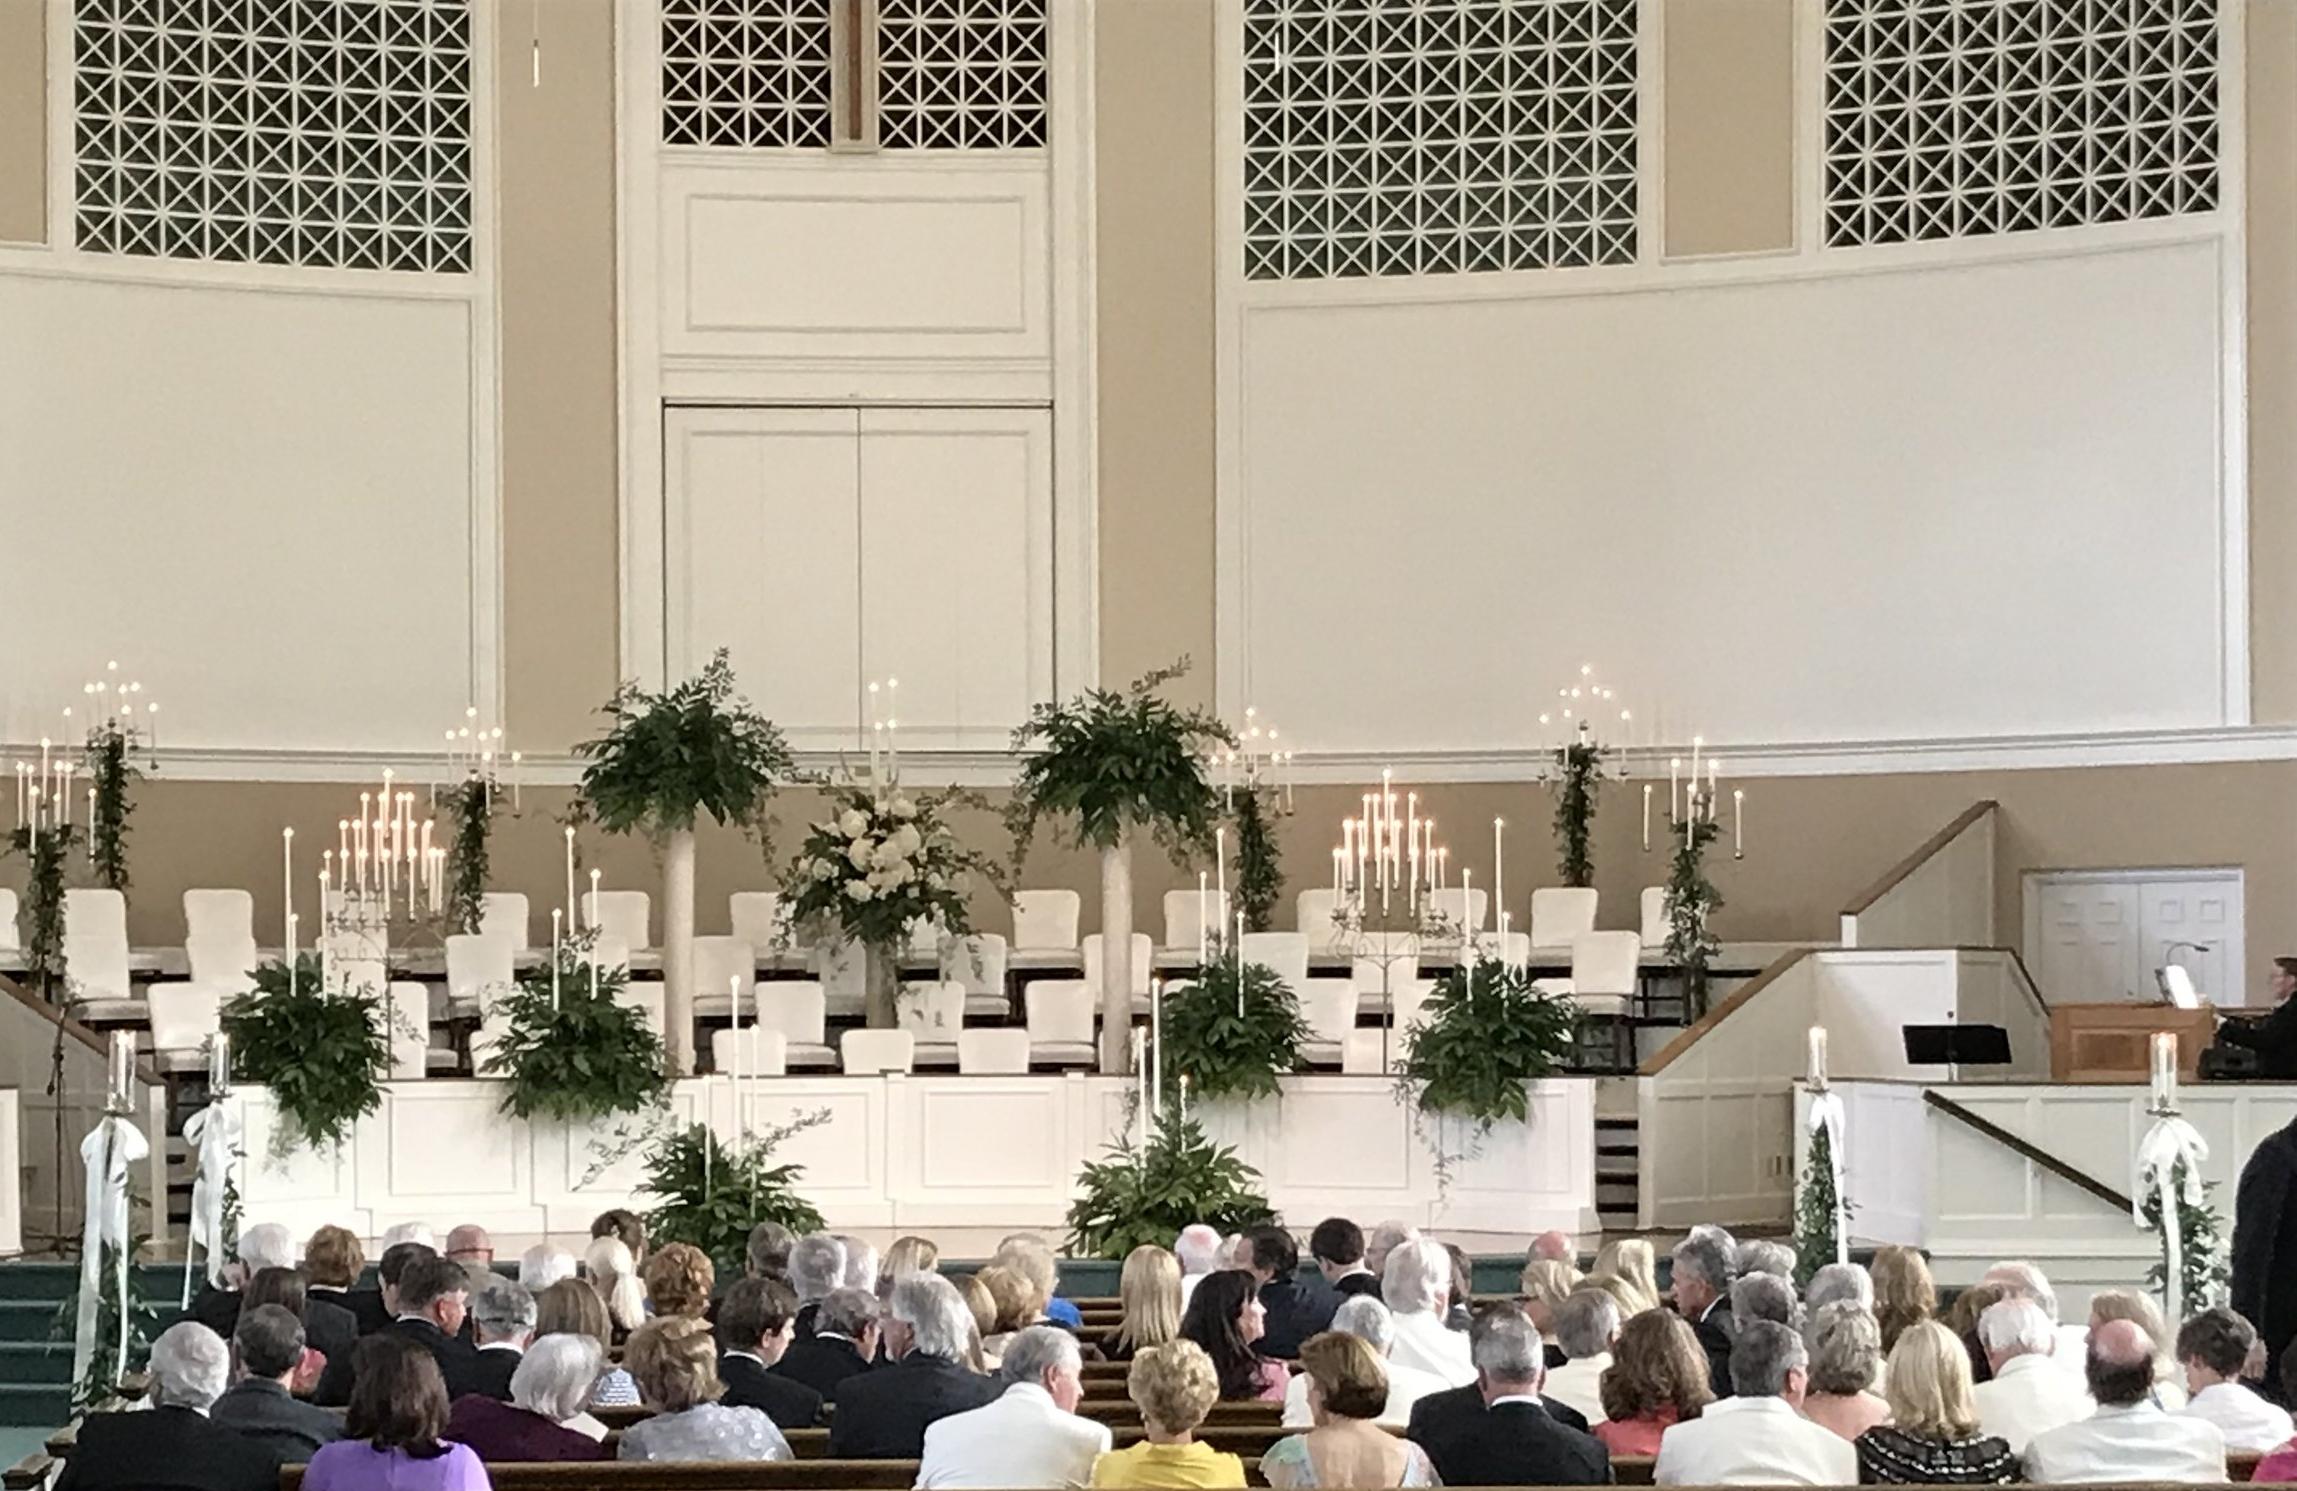 Sanctuary Wedding Pews 062518.jpg